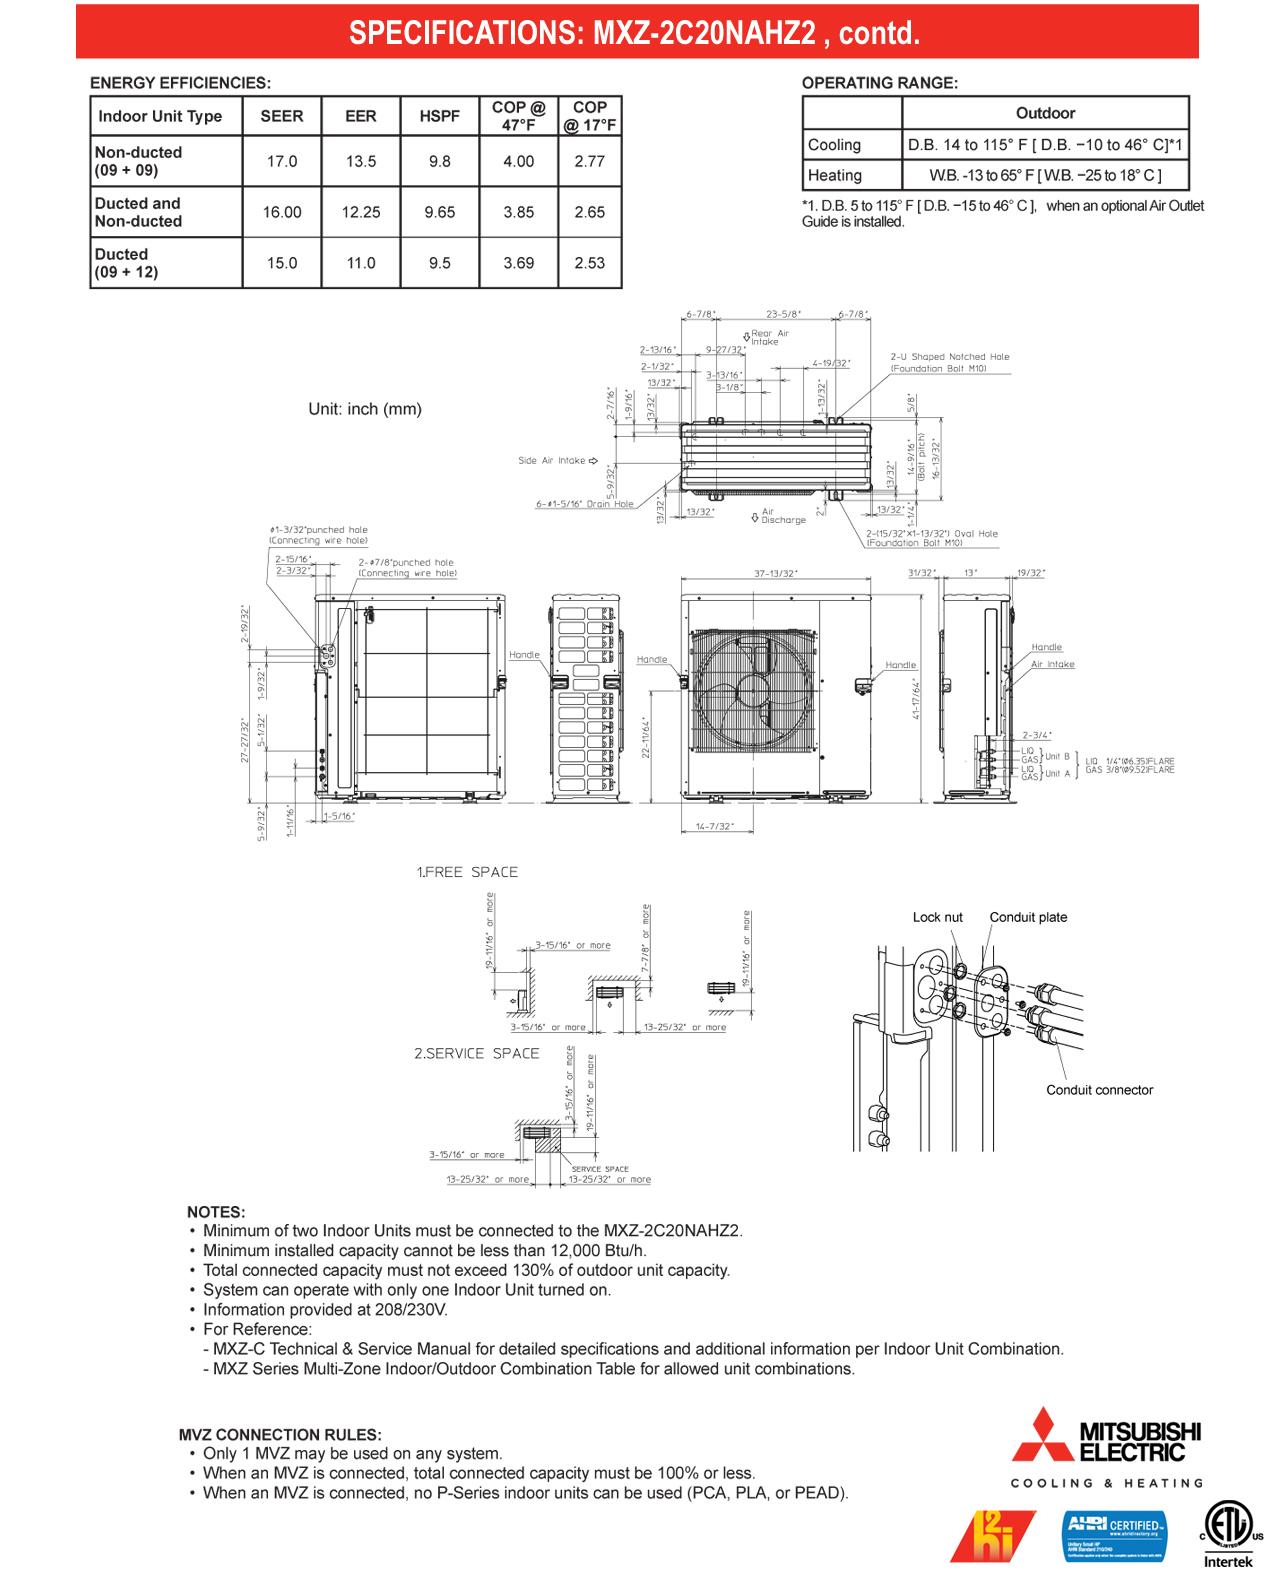 heil condensing unit wiring diagram chevy 250 engine diagrams, Wiring diagram